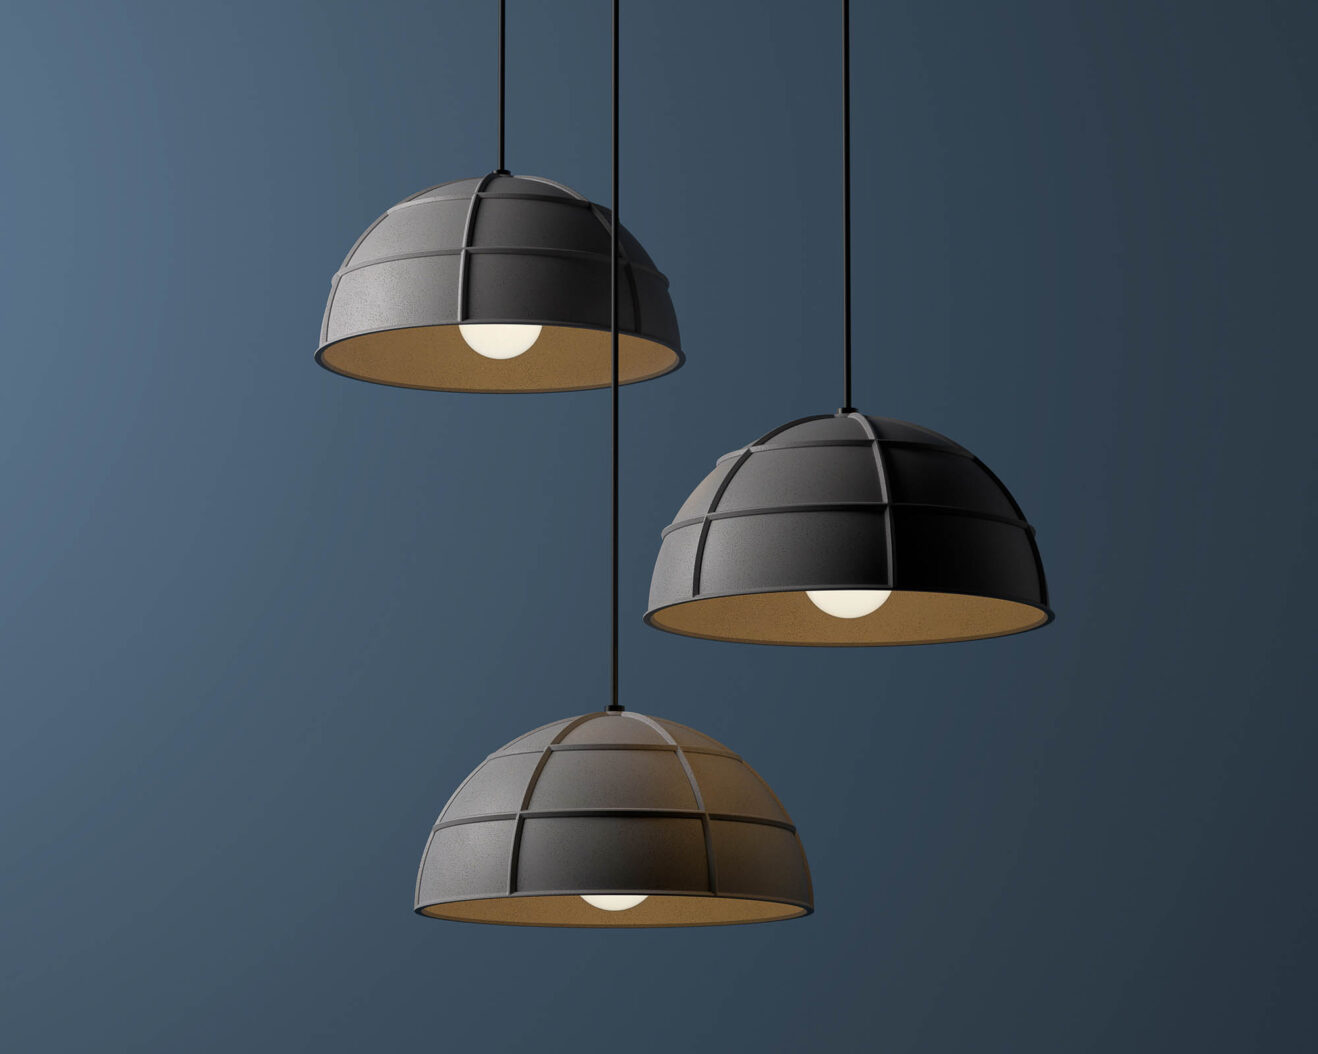 Leng-BentuDesign-pendantlamp2